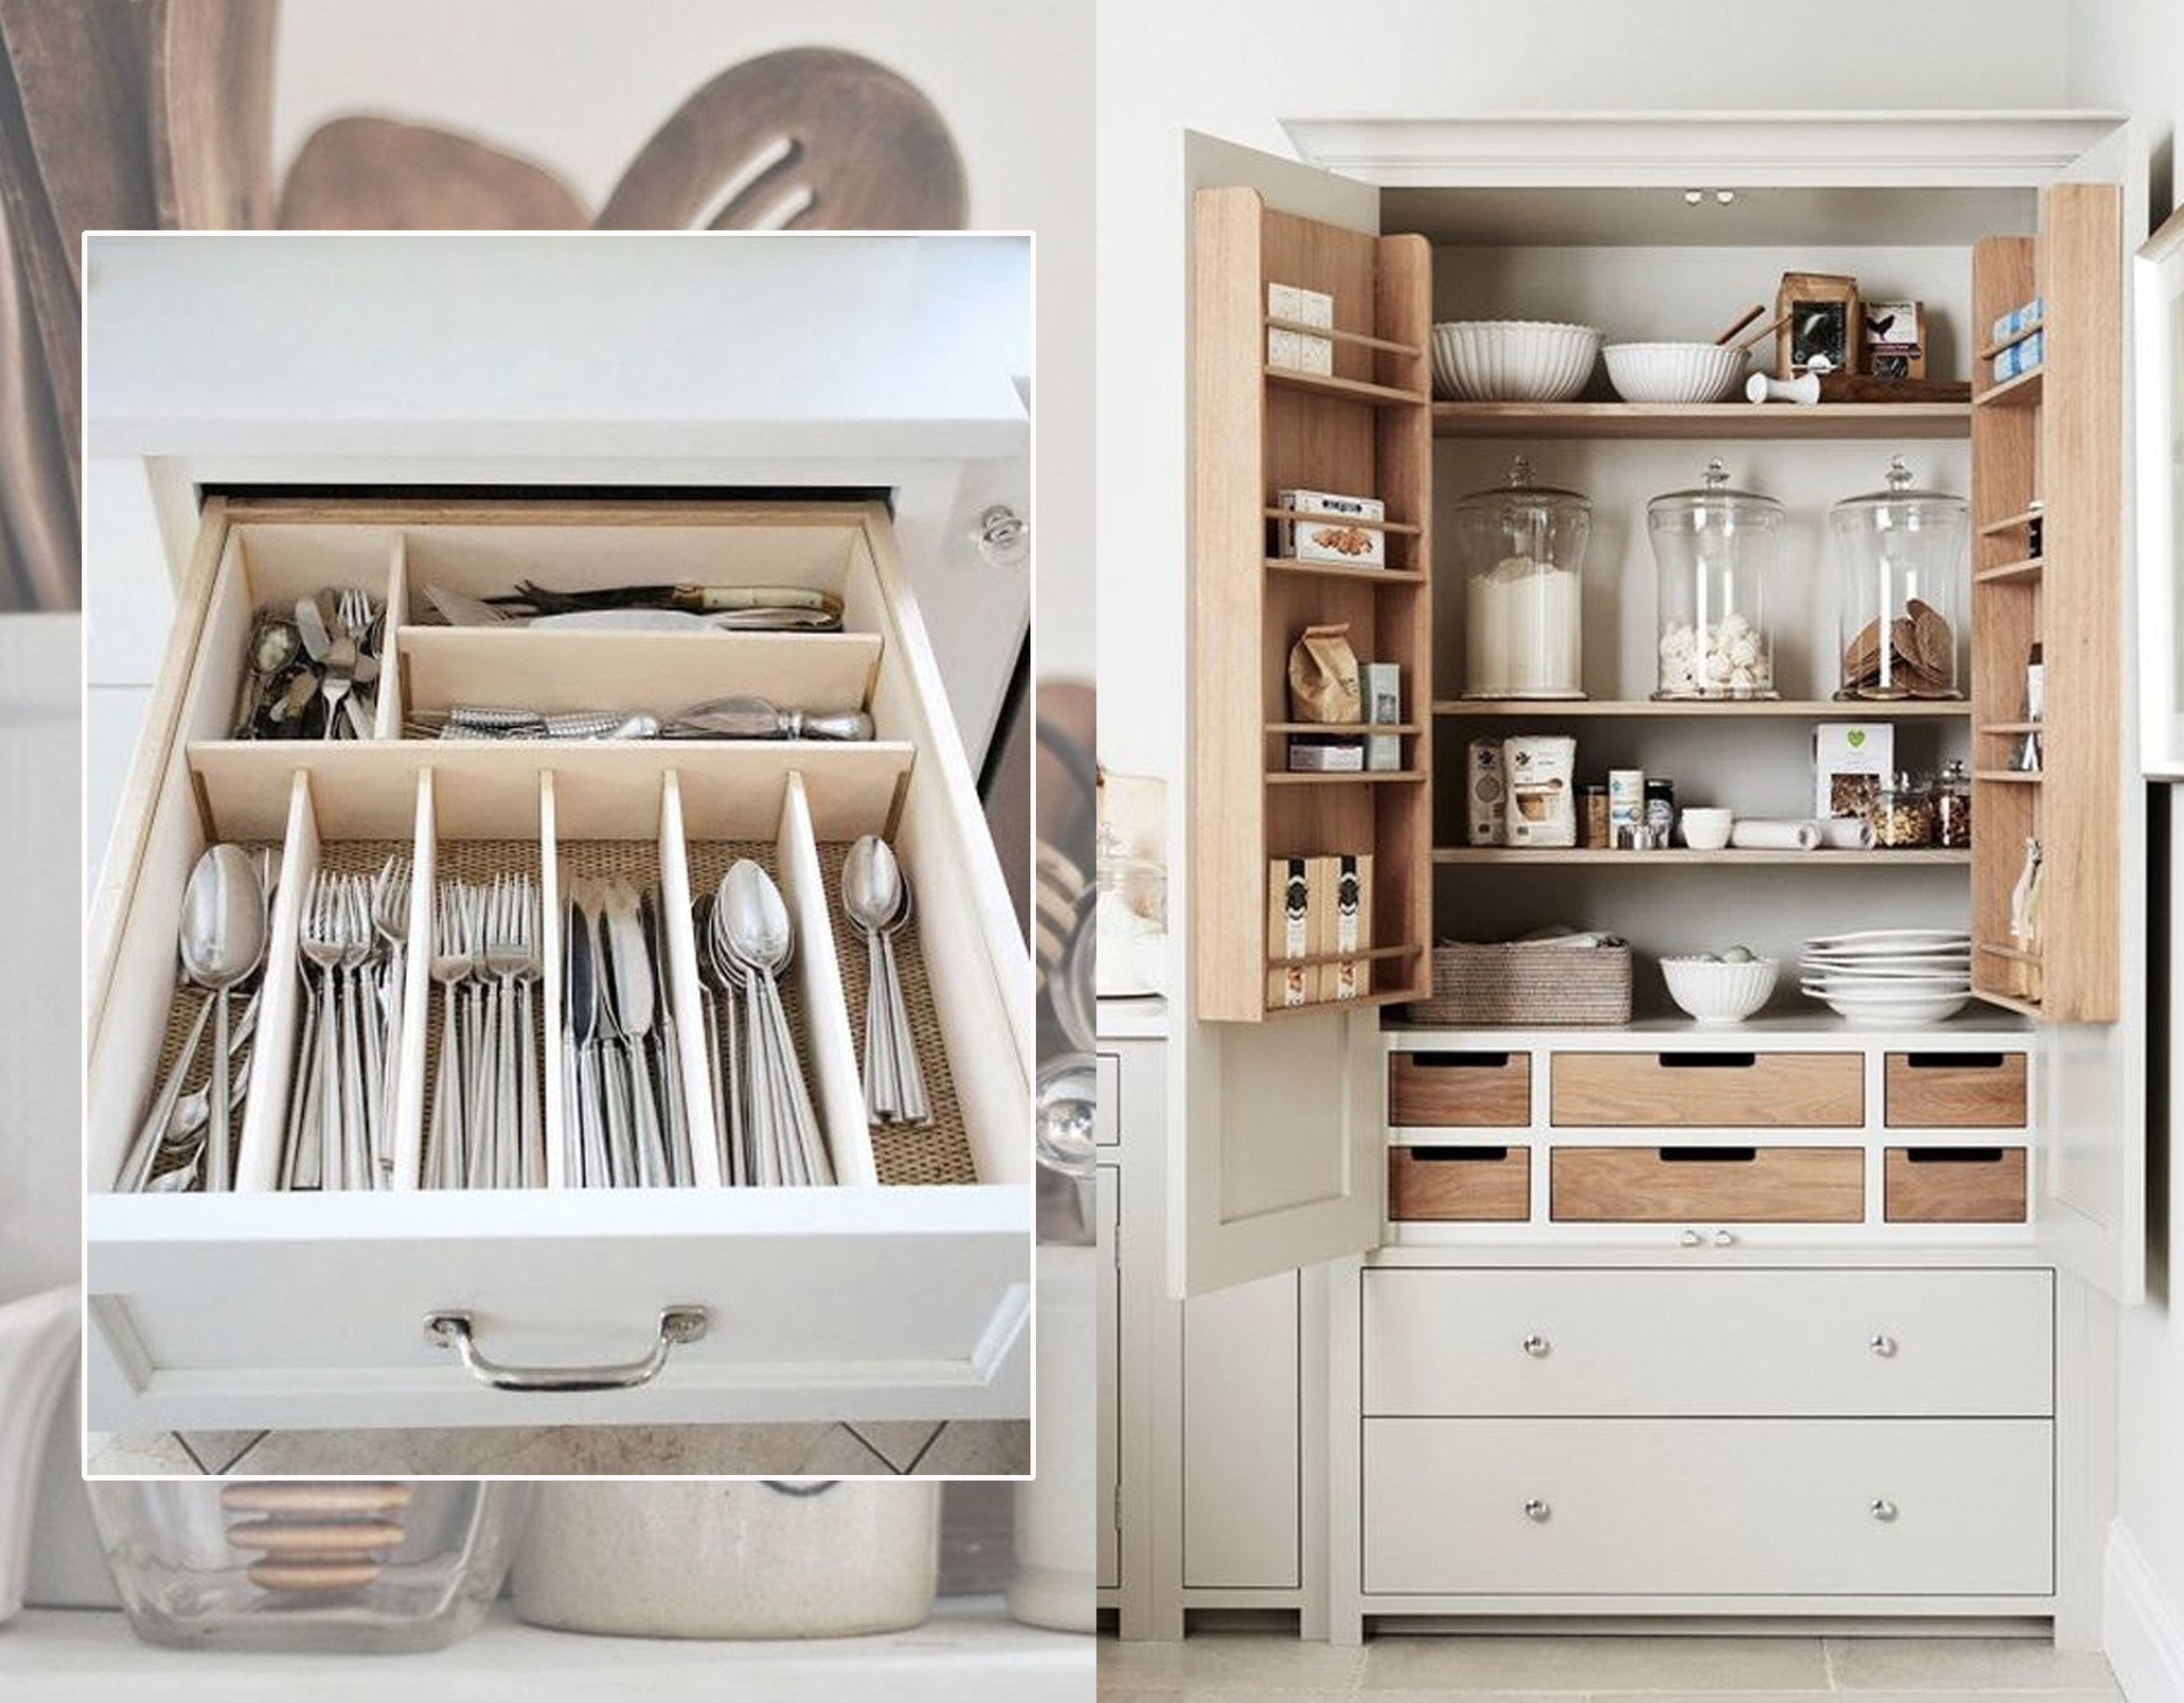 organized drawer via  Pure Wow  - pantry via